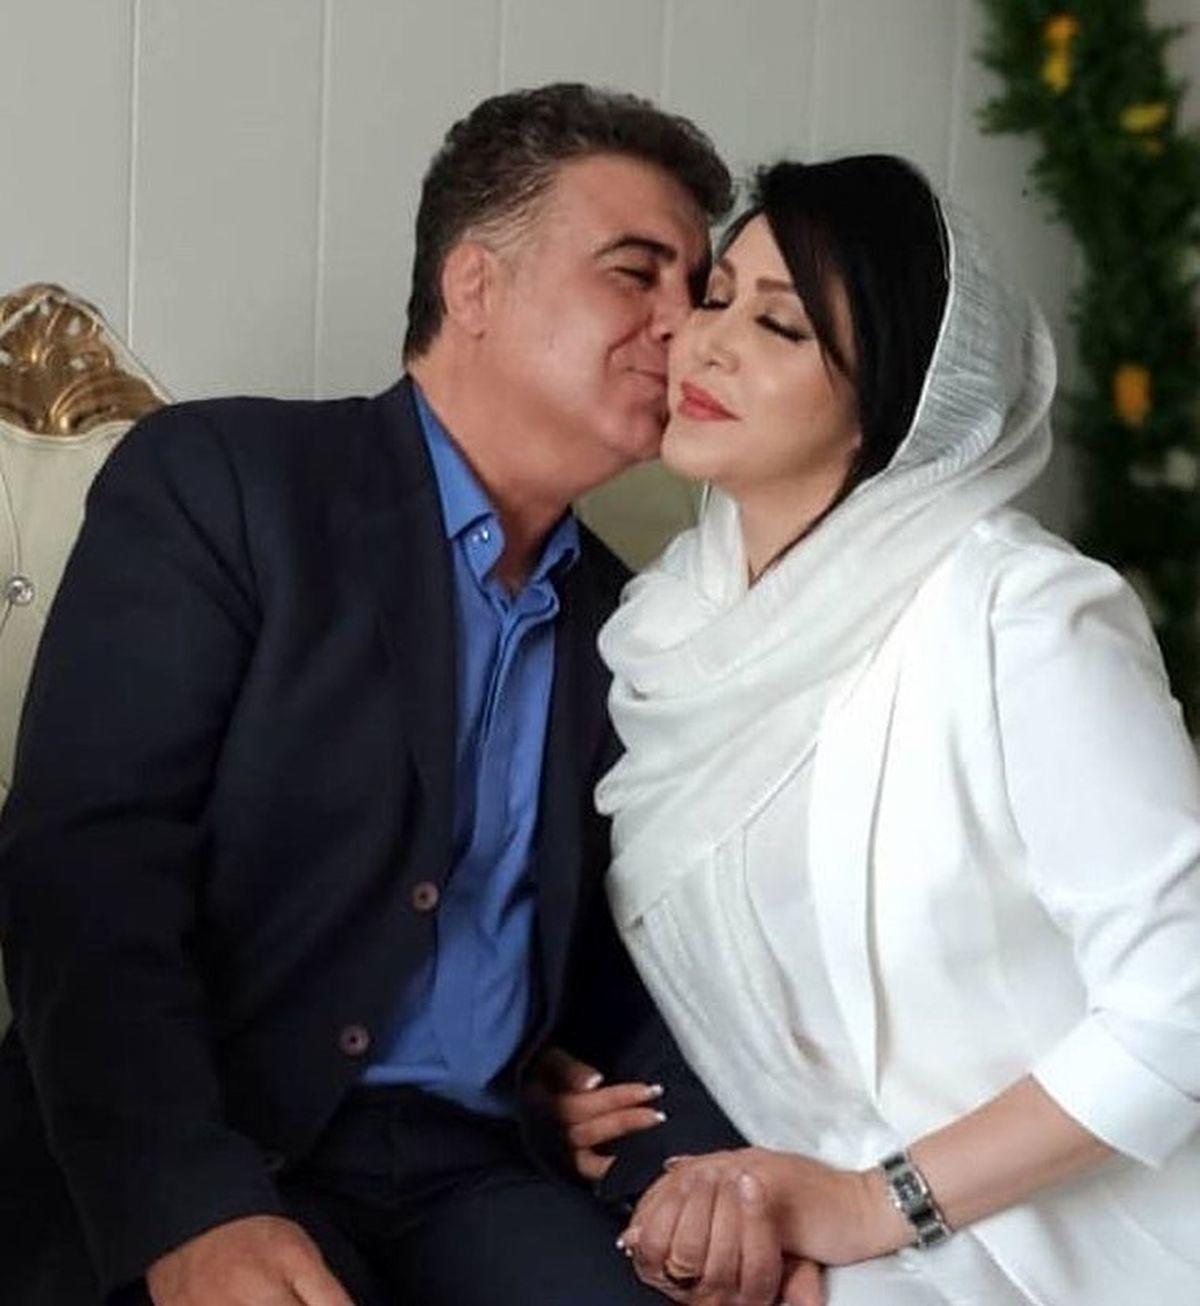 سلفی حسن شکوهی با همسر جدیدش + عکس